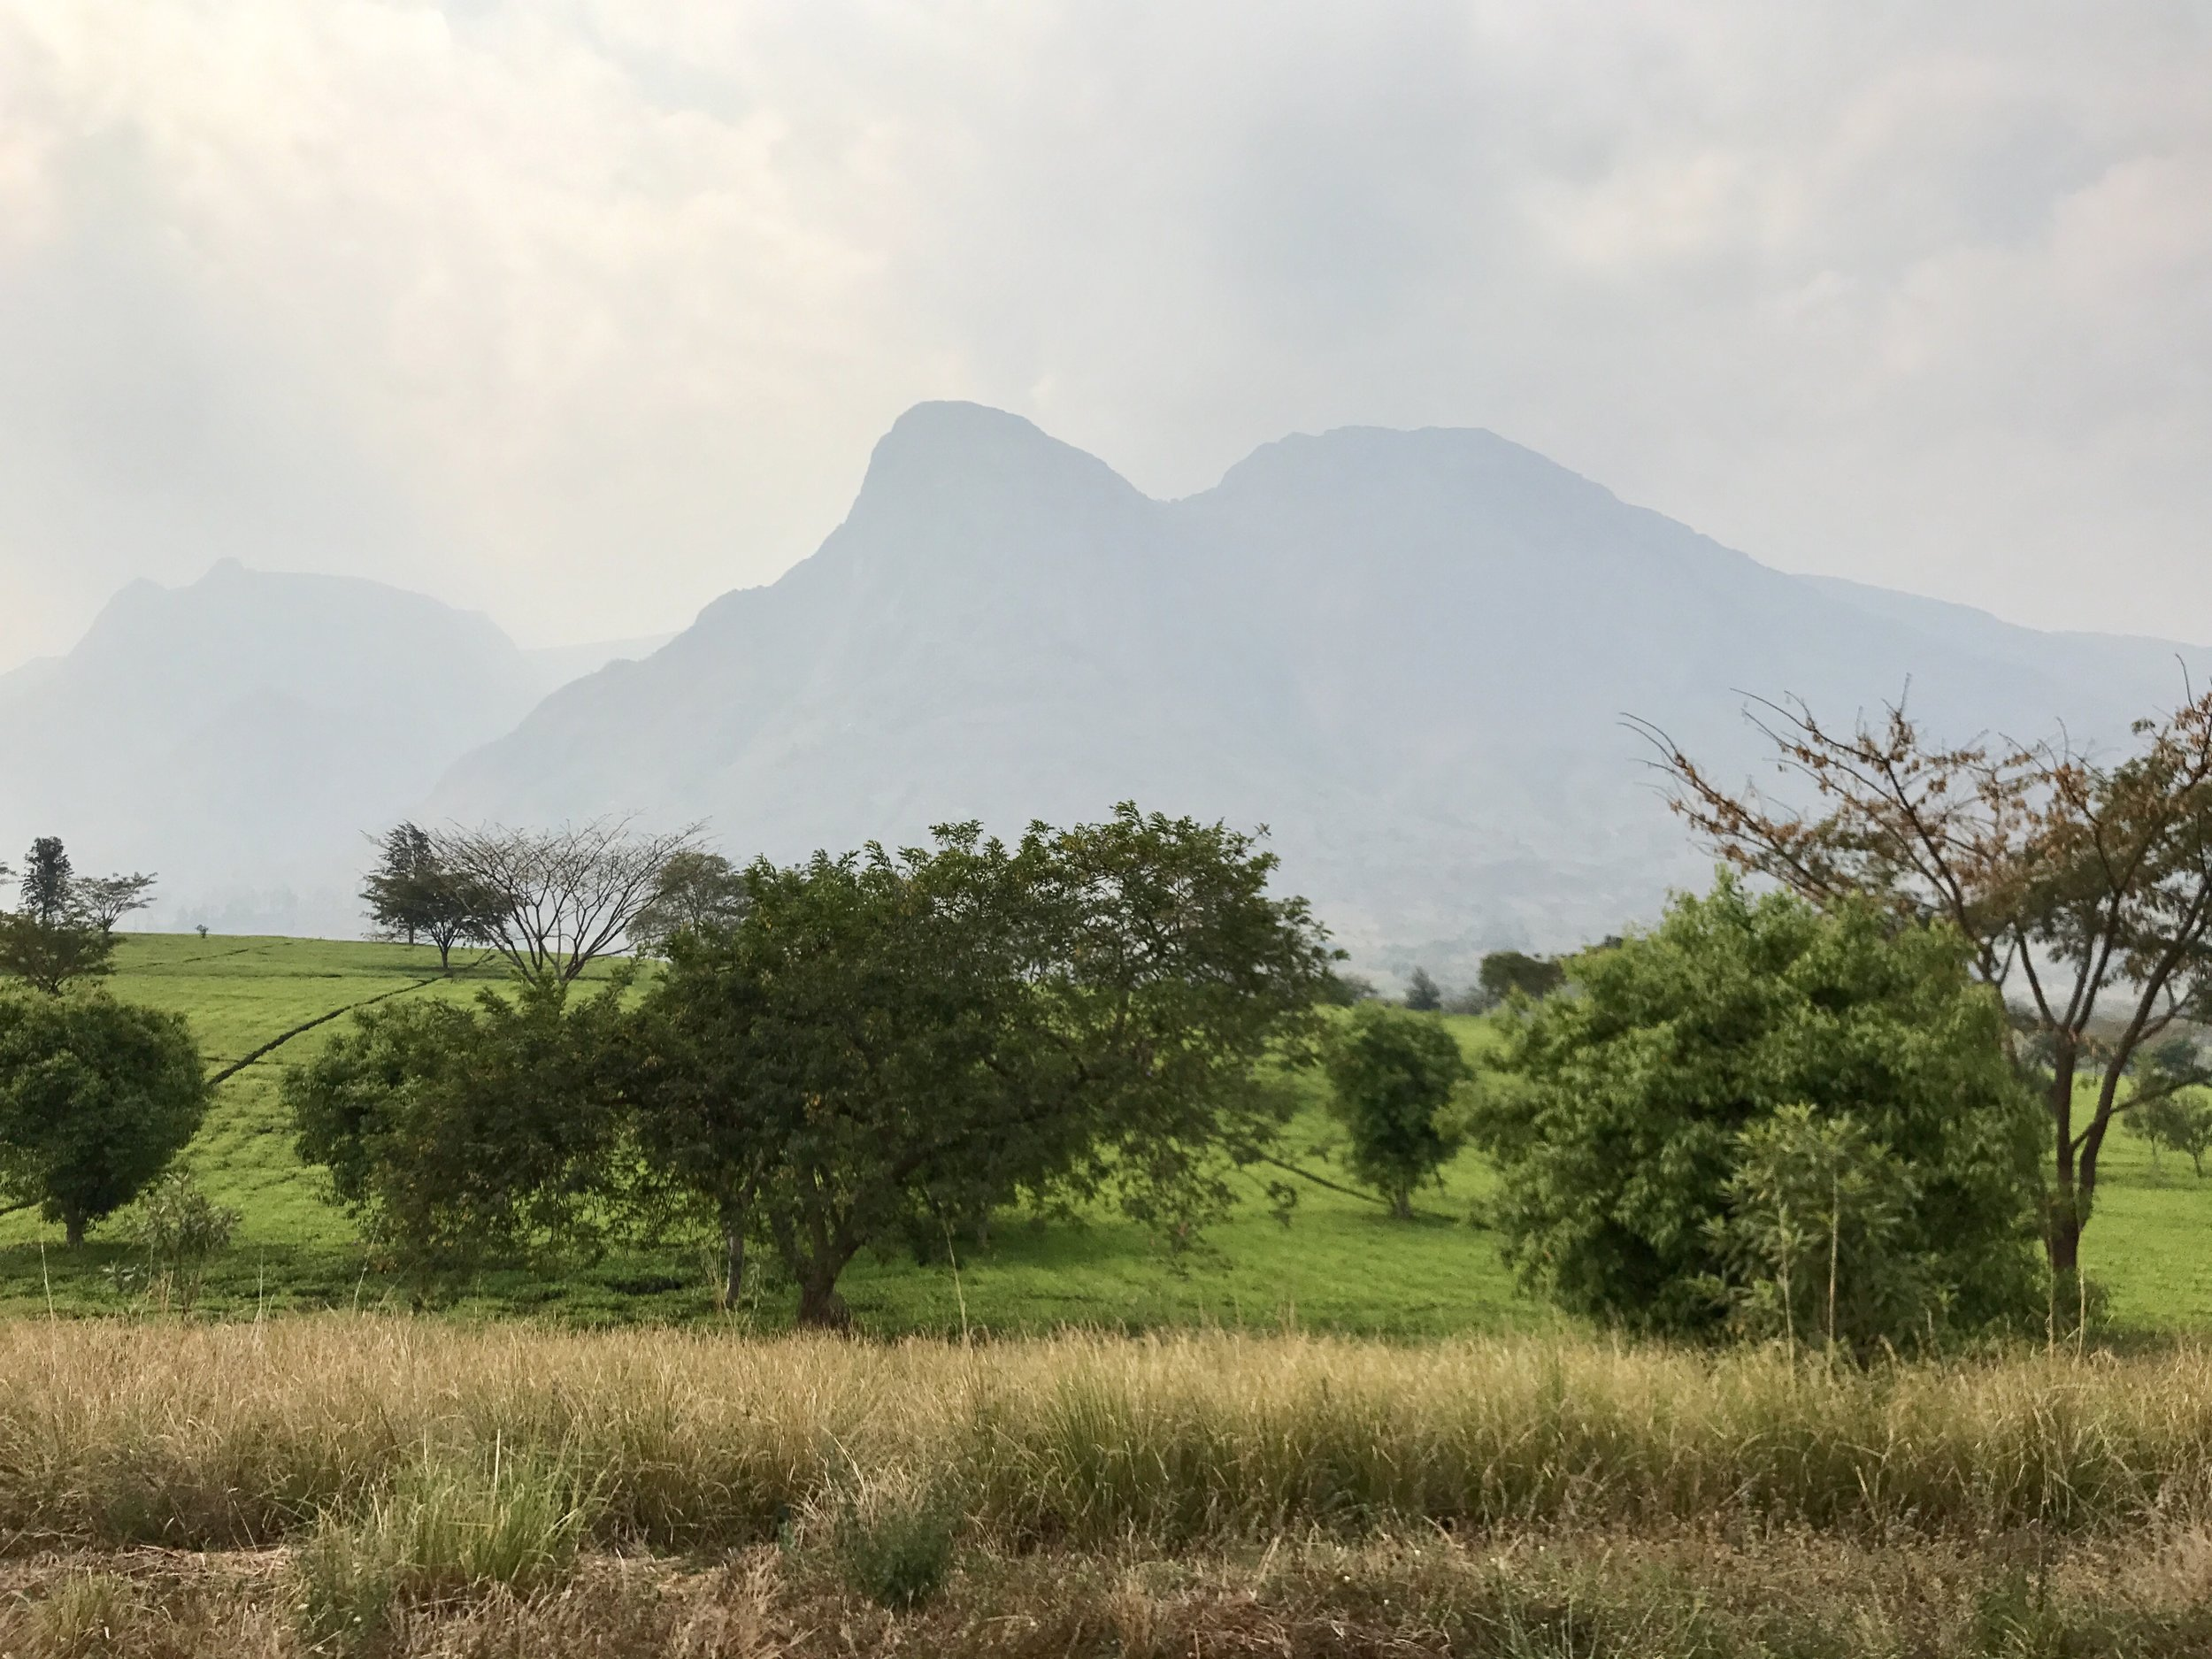 Mt. Mulanje--the highest mountain in Malawi